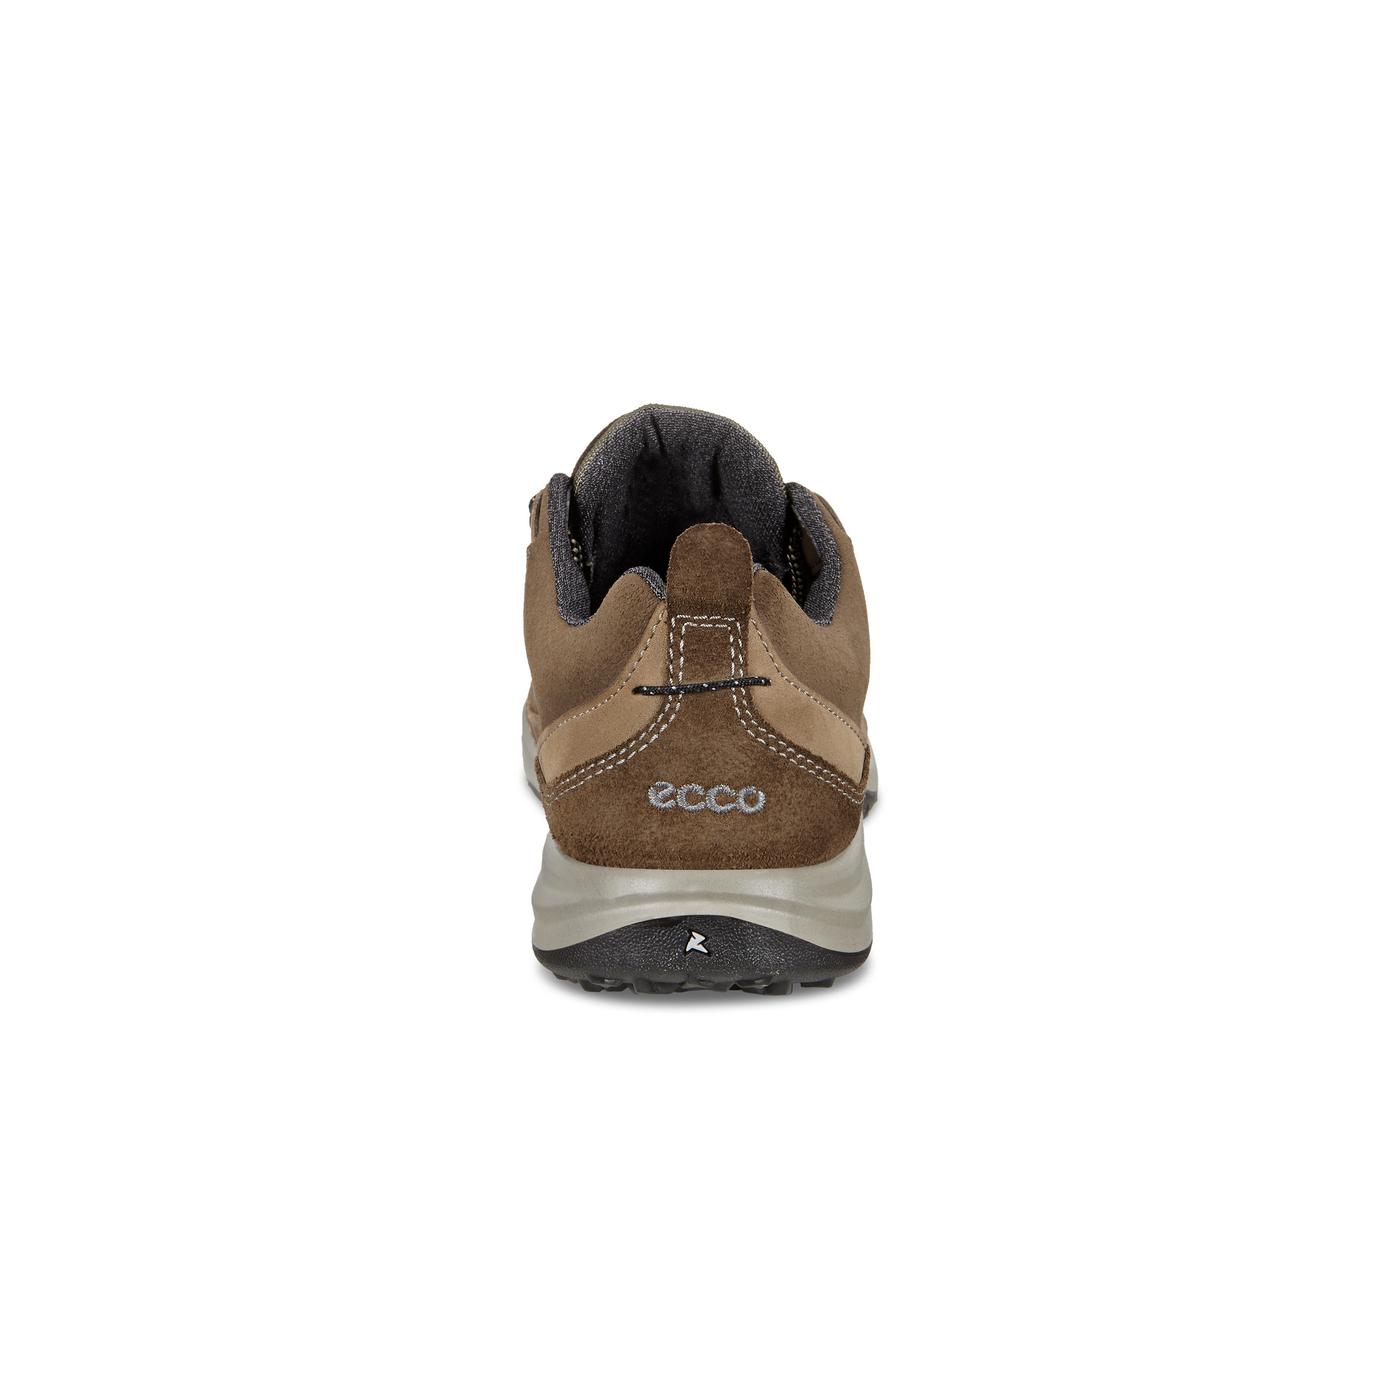 ECCO ESPINHO Outdoor Shoe